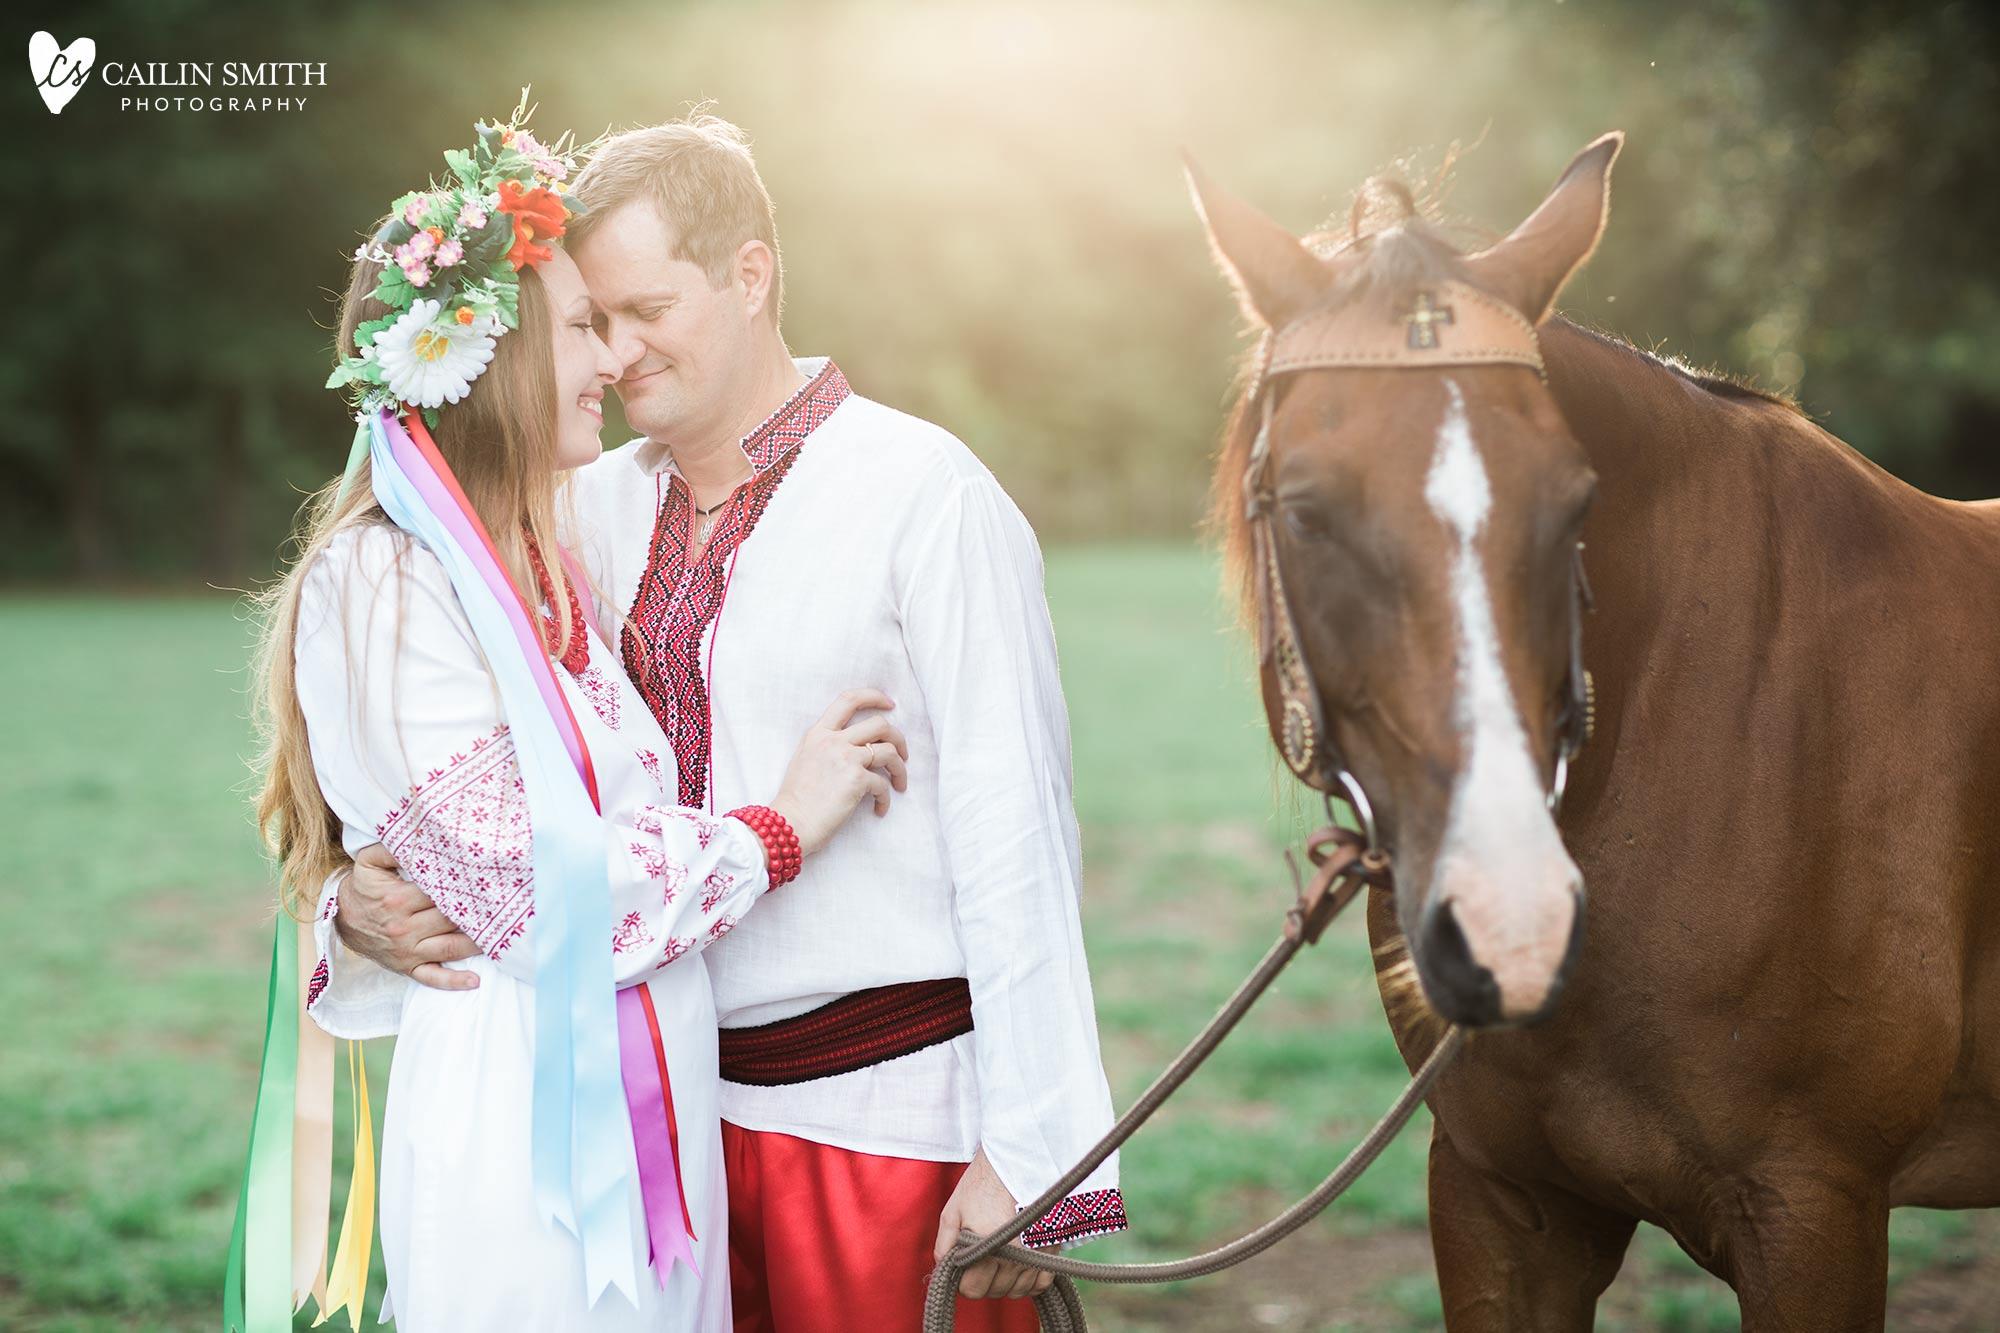 Tetiana_James_Horse_Engagement_Photography_0013.jpg